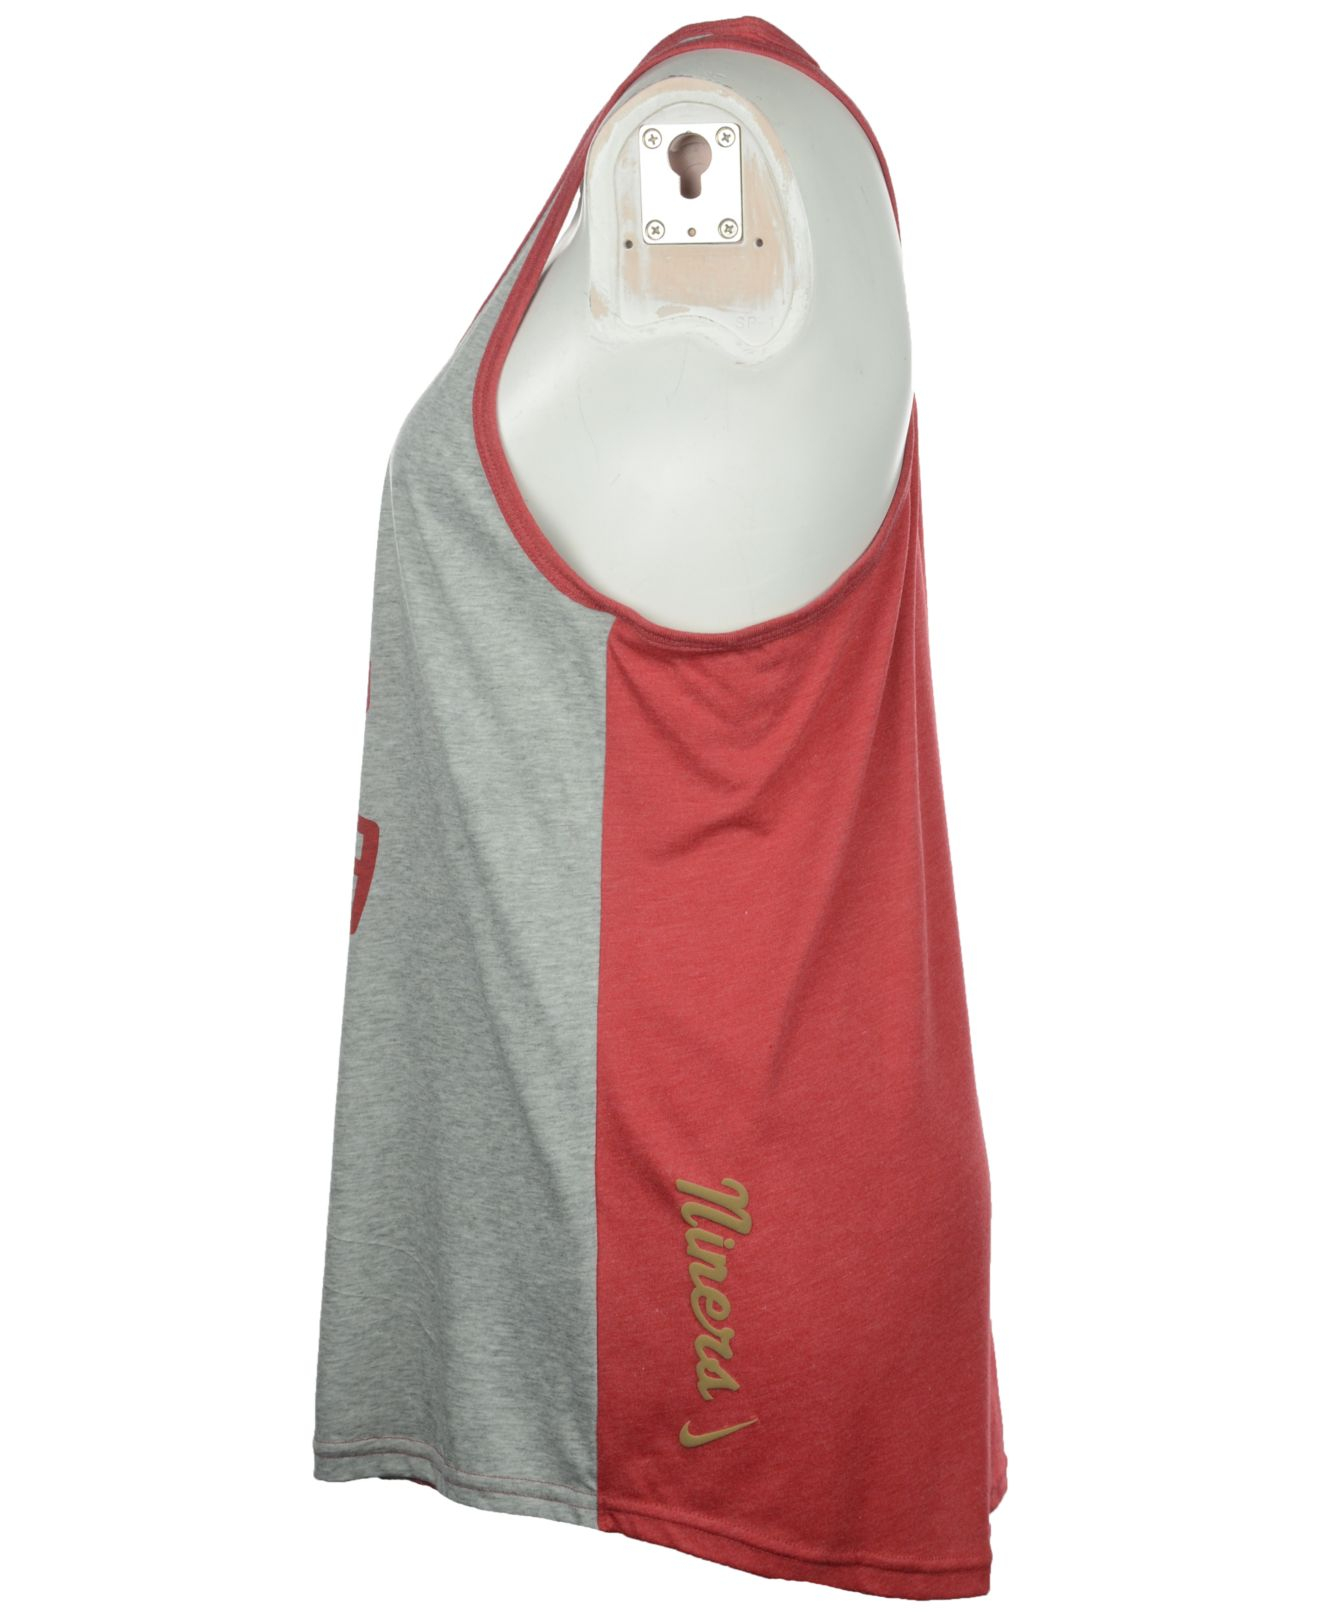 Lyst - Nike Women s San Francisco 49ers Helmet Tank Top in Gray bec349f1c